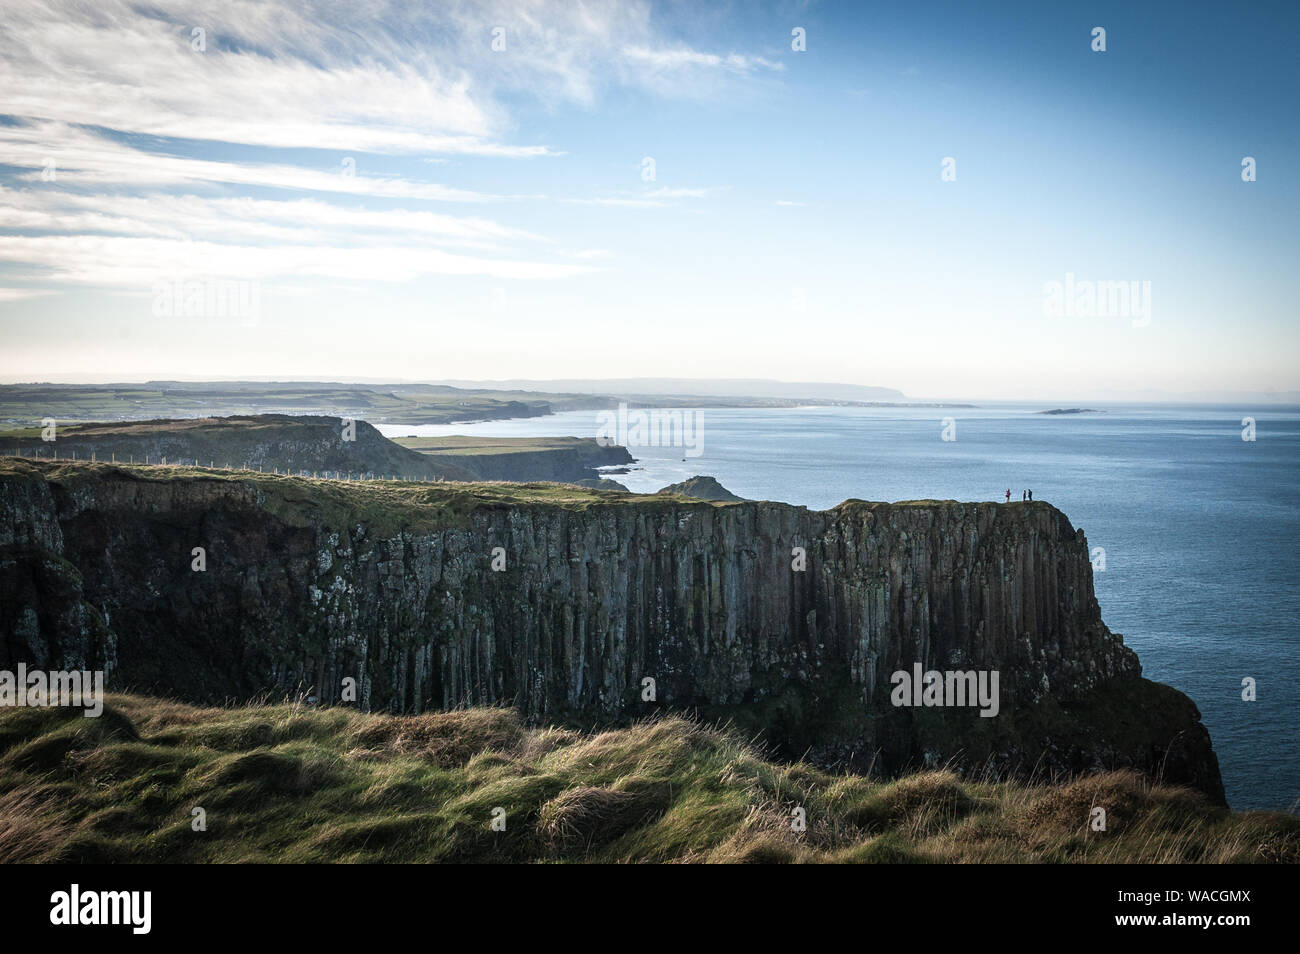 The Giant's Causeway cliff walk Stock Photo